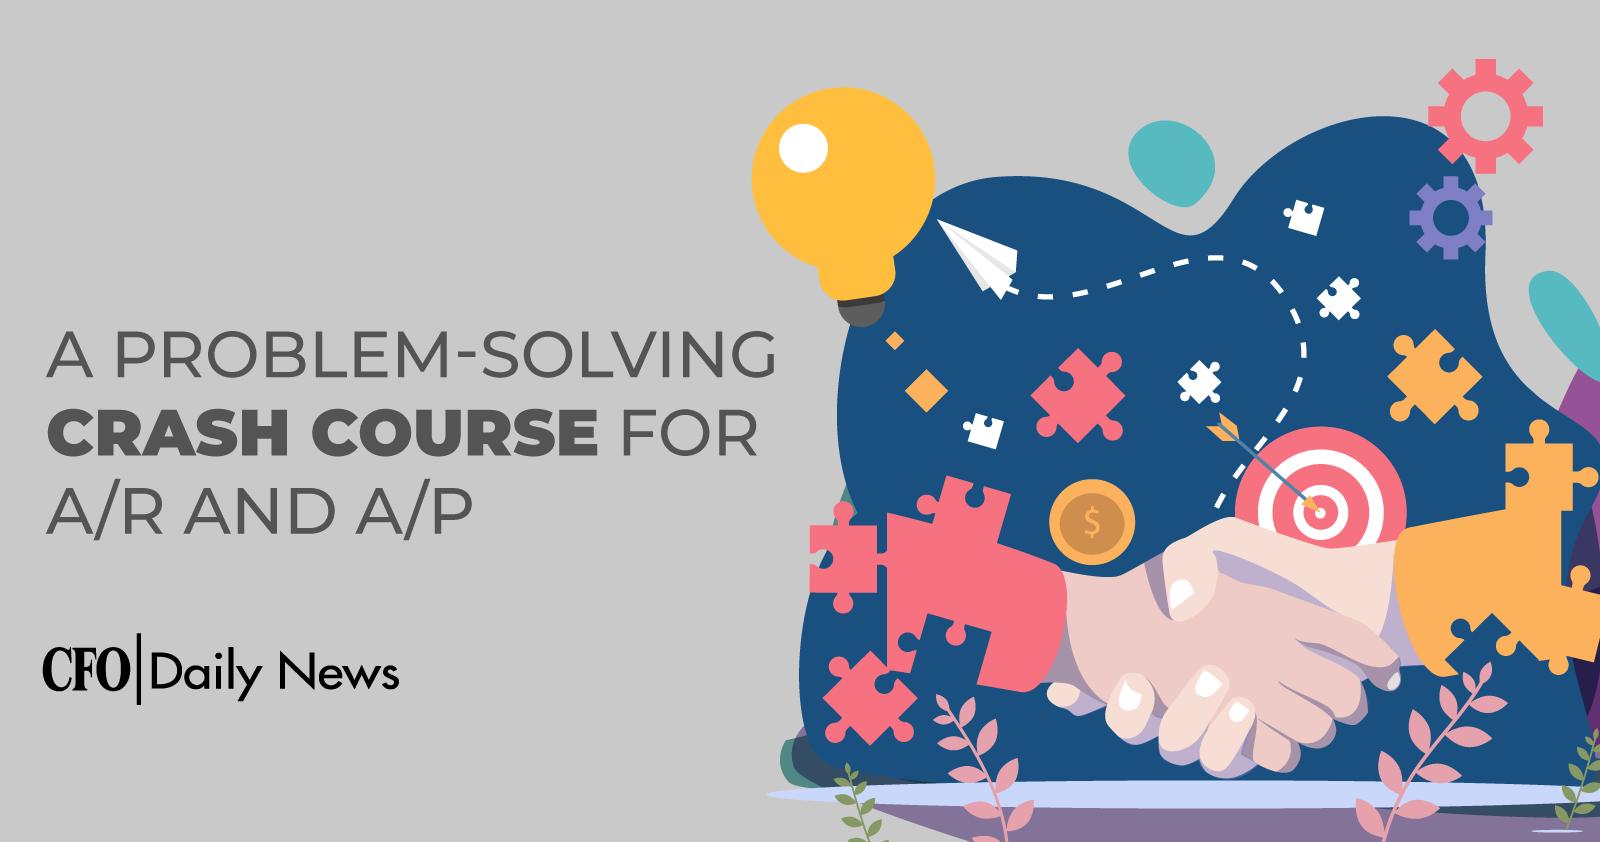 A Problem-Solving Crash Course For AR And AP